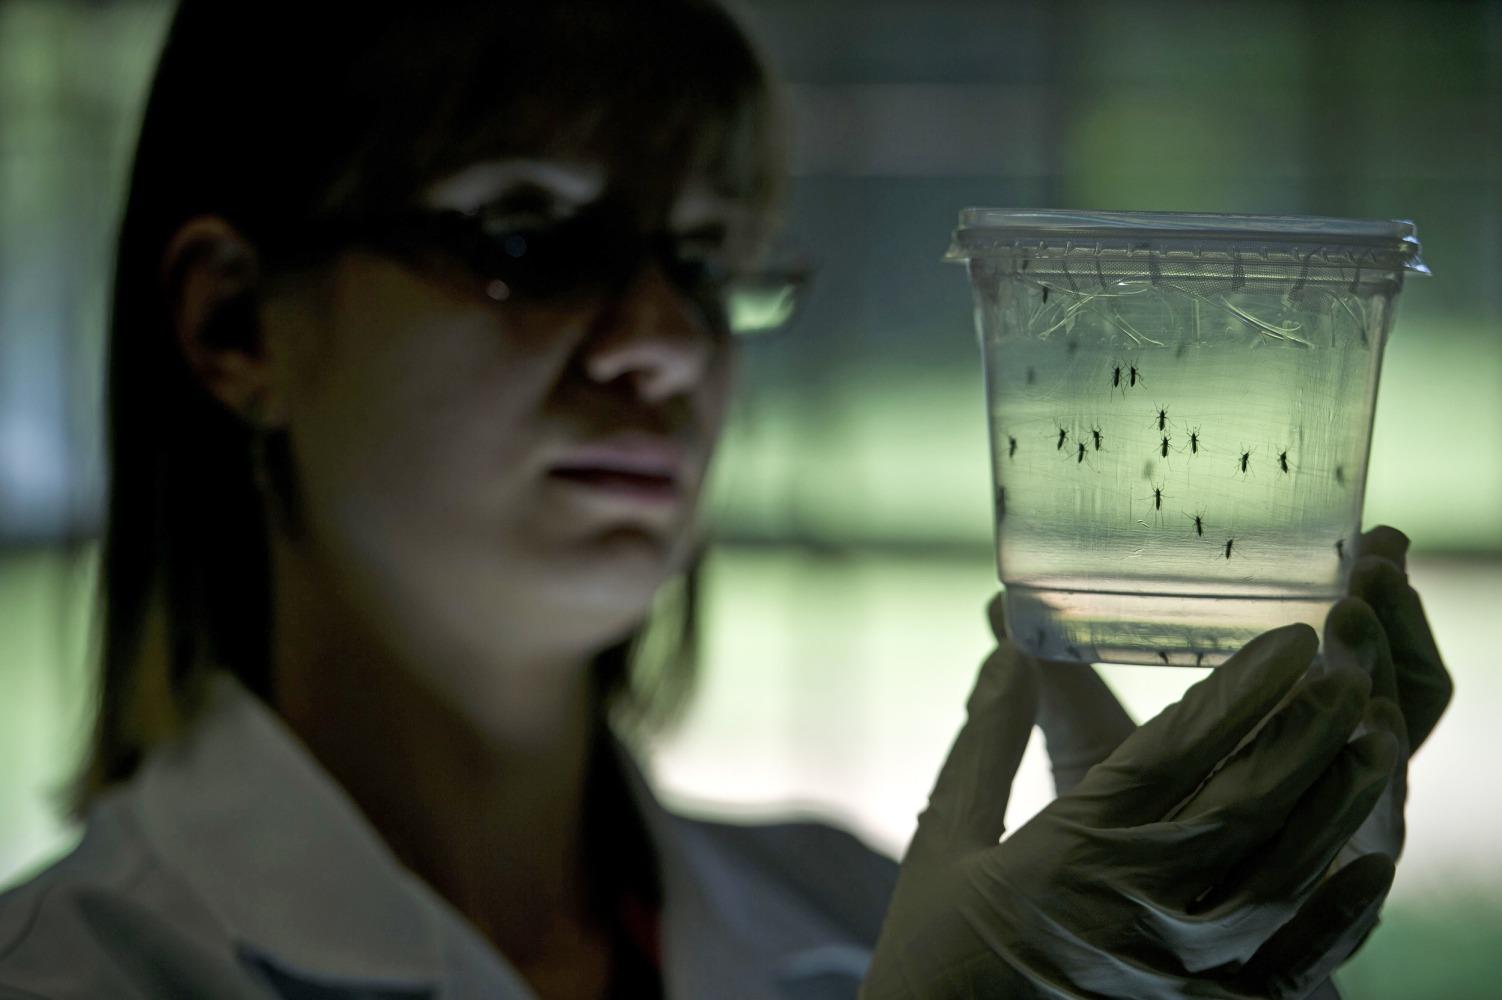 Baby born in Hawaii has birth defect linked to Zika virus